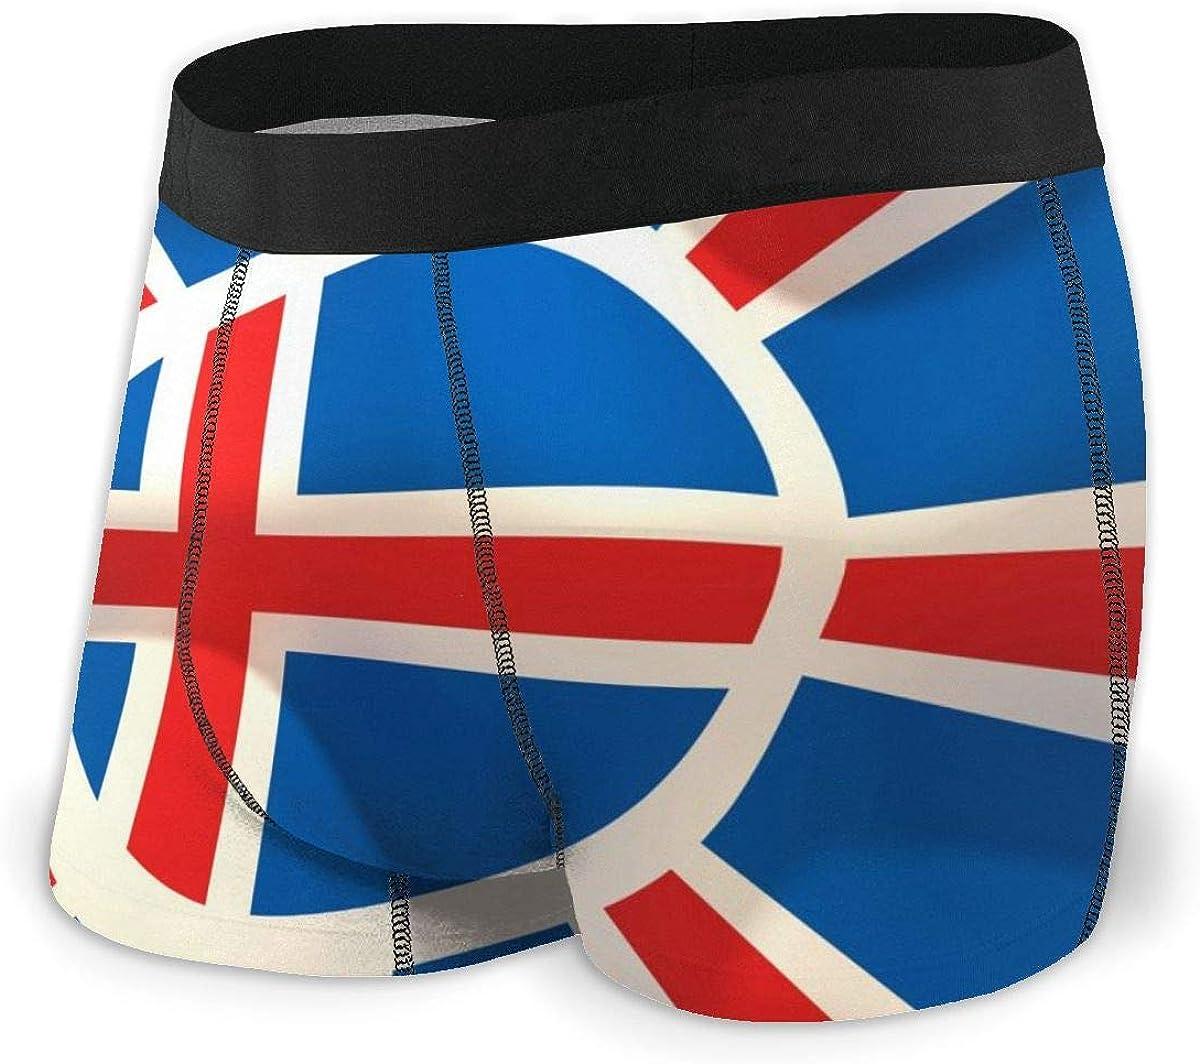 Mens Boxer Briefs Special Iceland National Flag Boys Trunks Underwear Short Leg Breathable Man